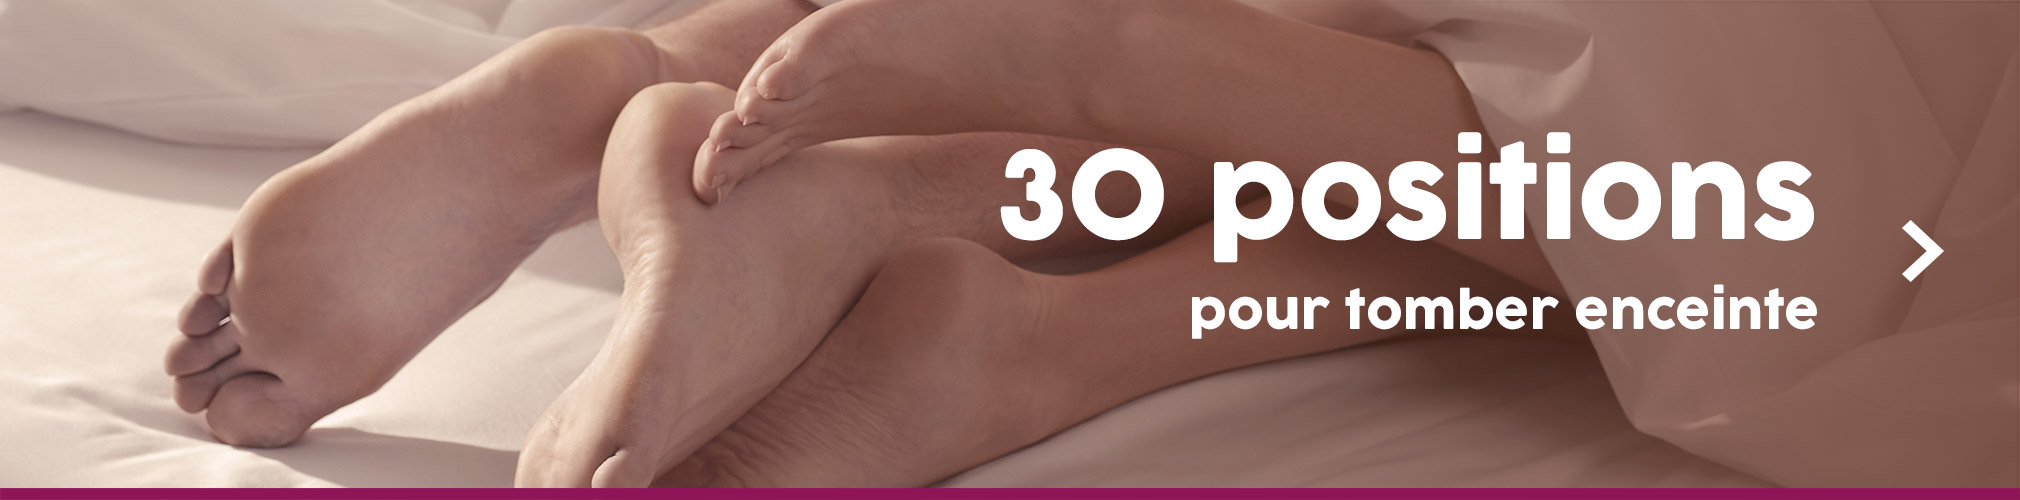 30 positions pour tomber enceinte